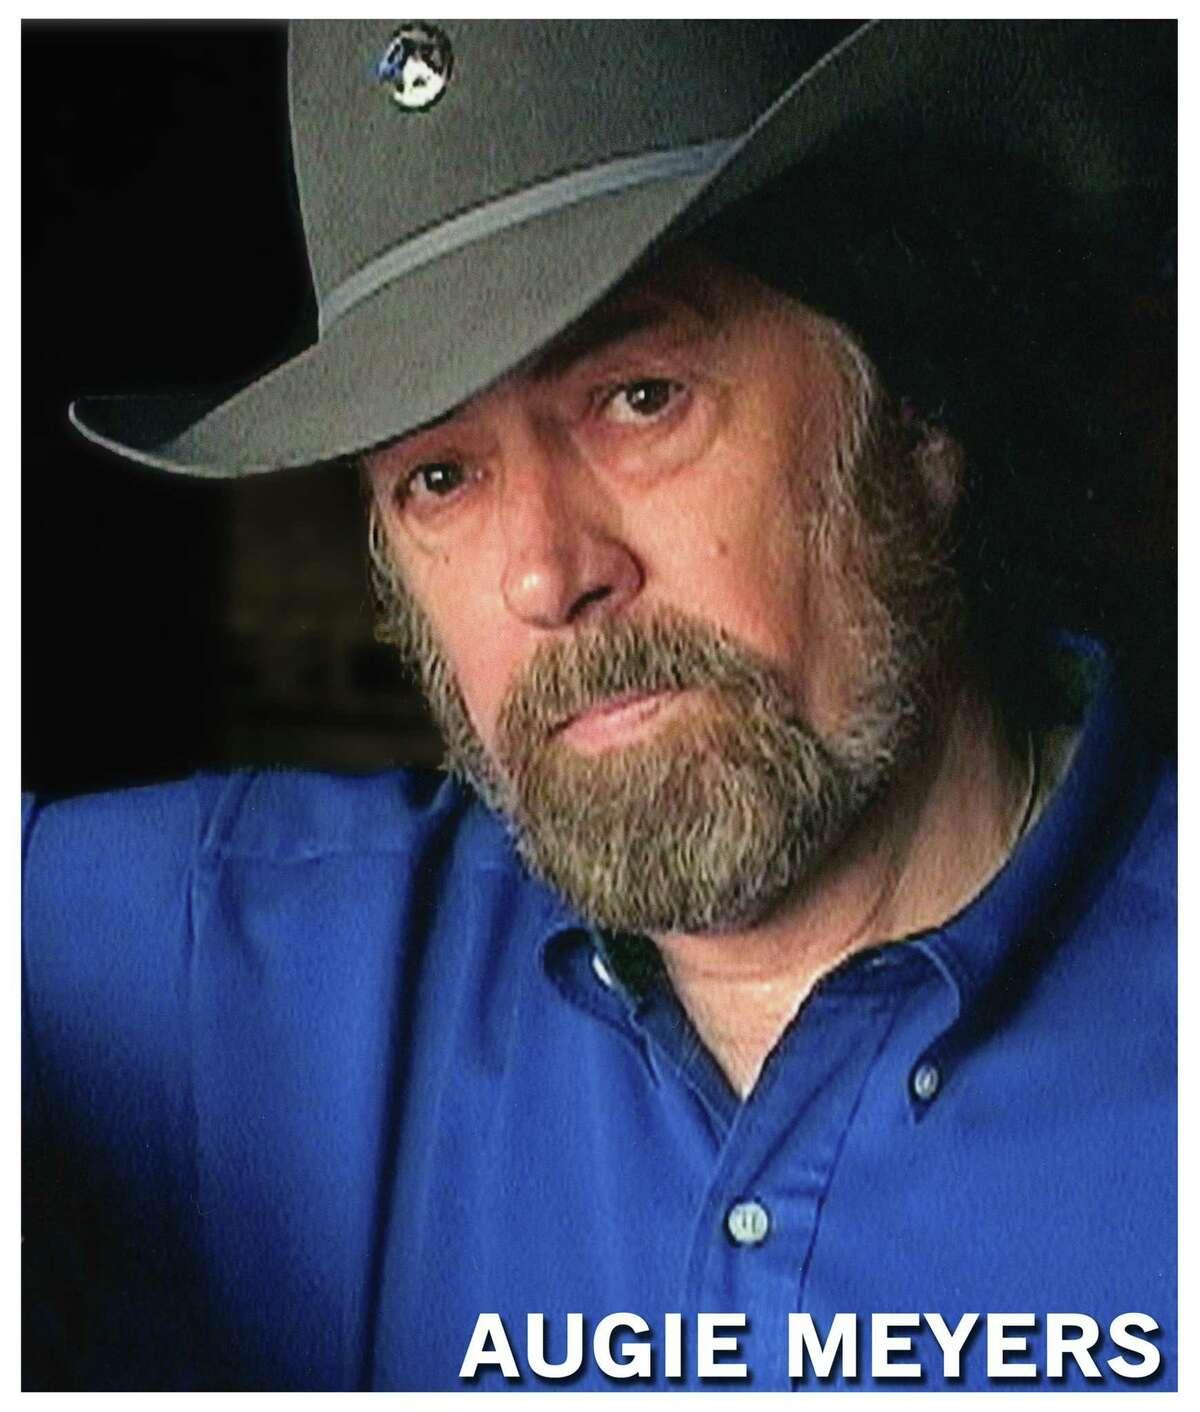 Legendary Texas musician Augie Meyers